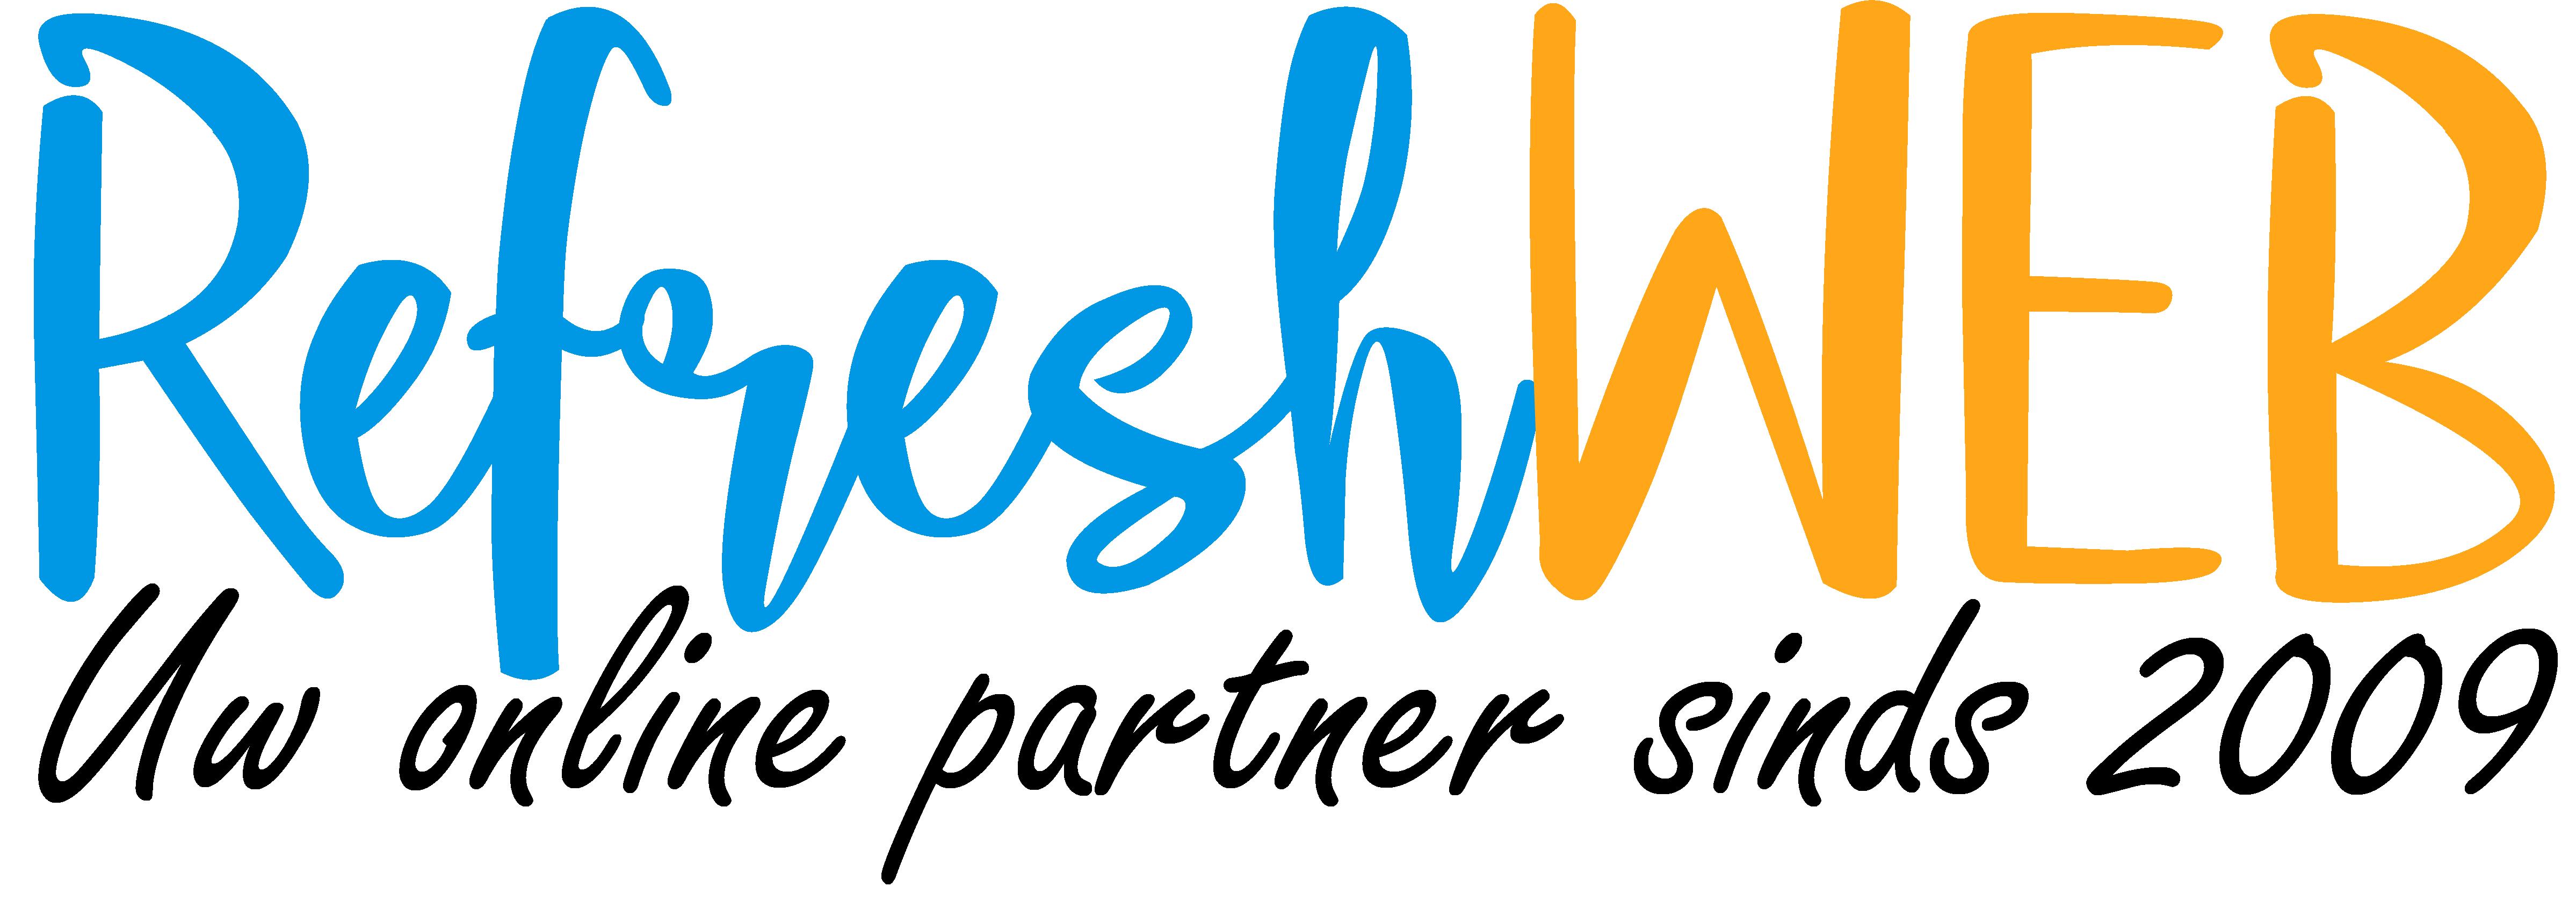 RefreshWEB.nl